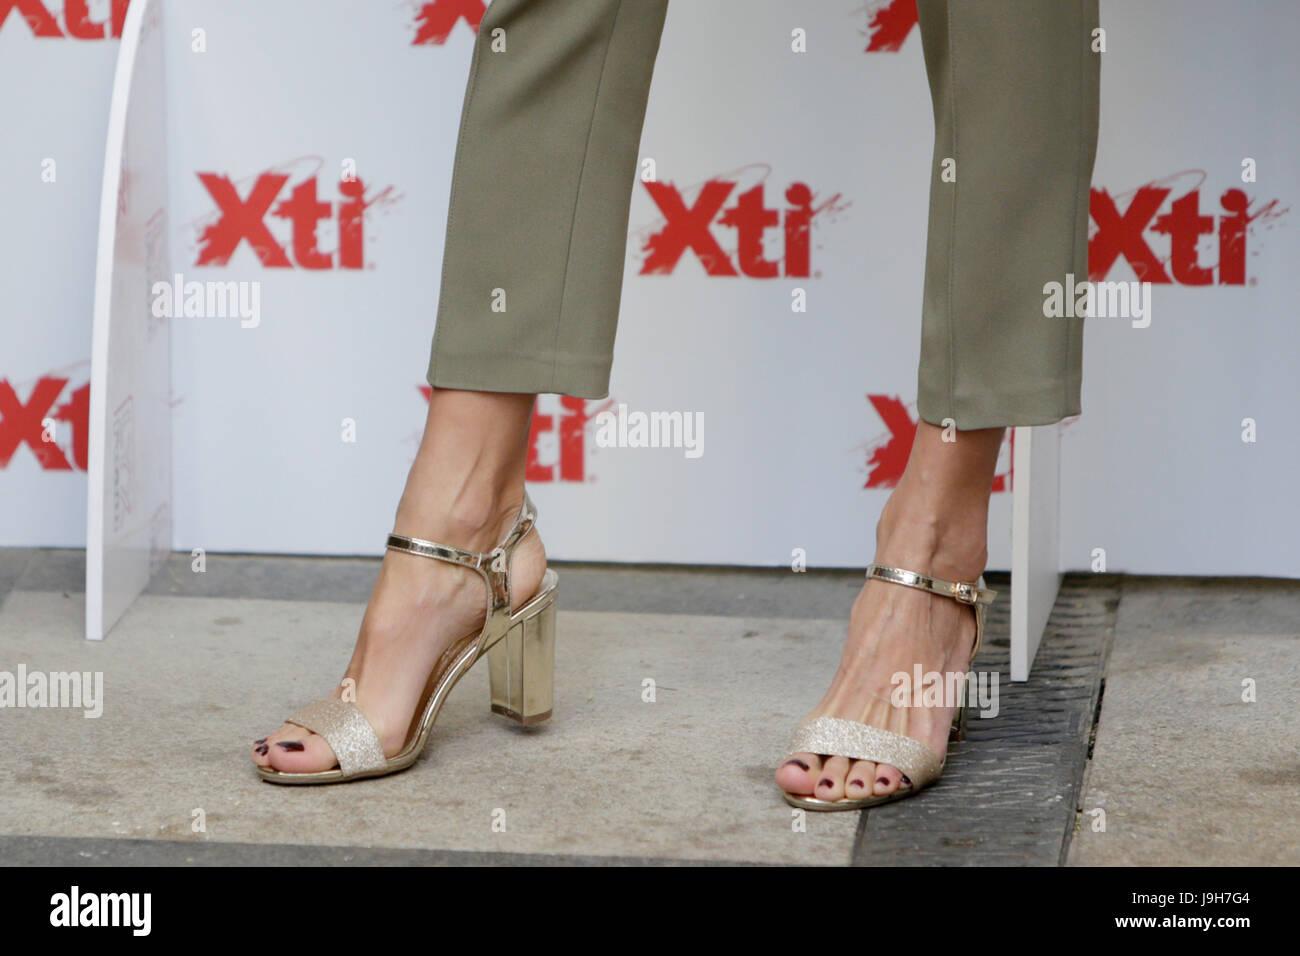 Xti Schuhe Stockfotos Xti Schuhe Bilder Alamy